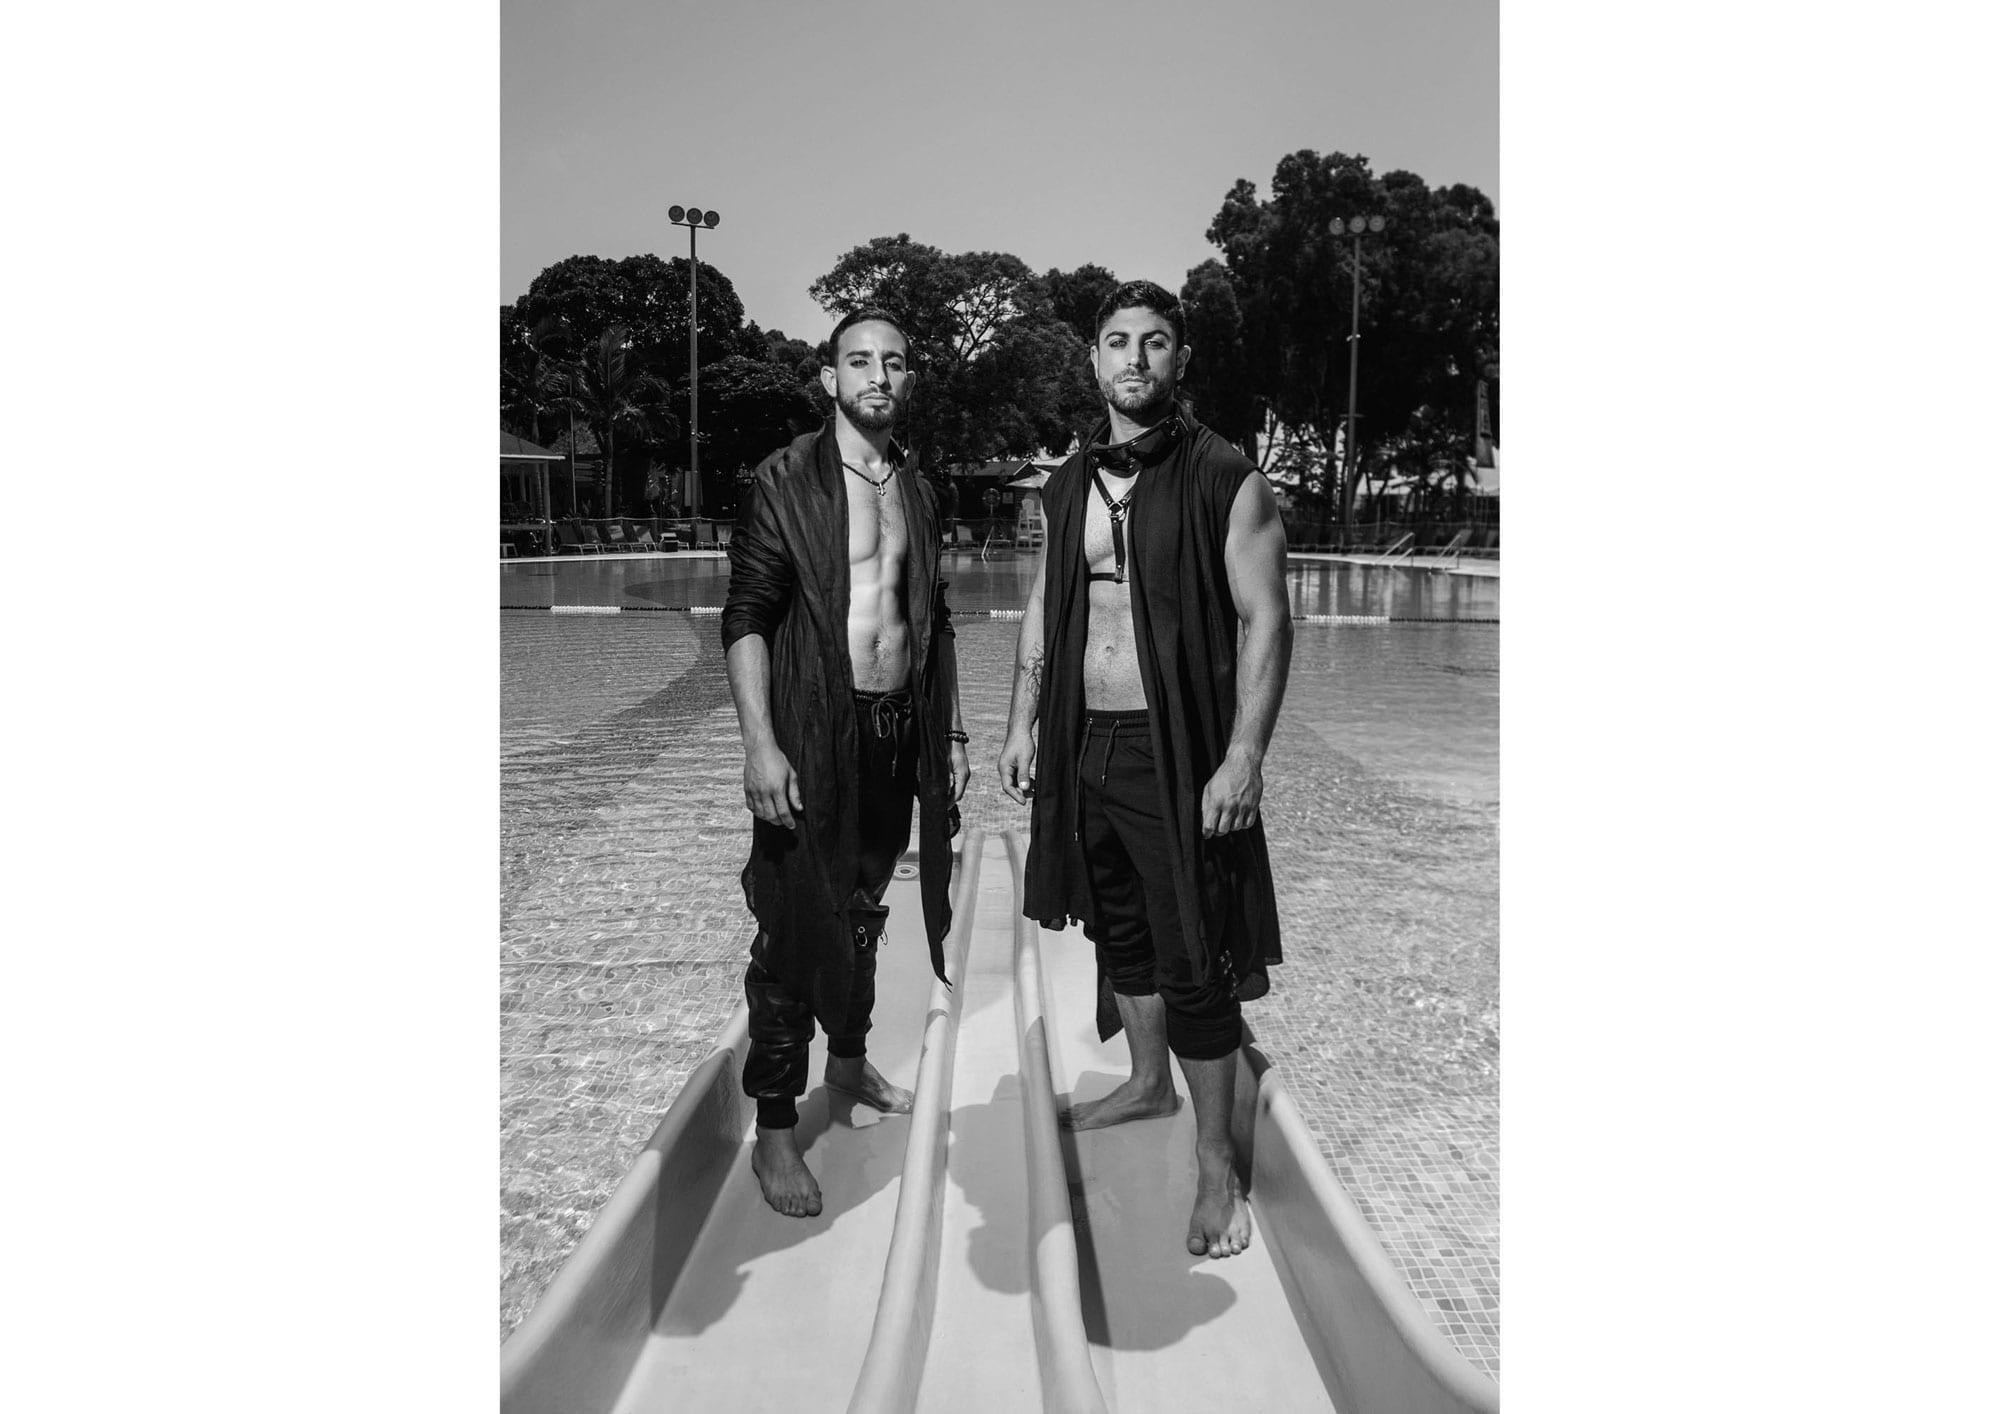 Photography: Segev Orlev Styling: Mauricio Arcillo, Fashion: Aarketa, Makeup Artist: Orna Rimok, Hair Stylist: Elad Uziel, Hair & Makeup: lior krispel, Models: Sami Dadon, Yinon Perets, Ldor Bar Or, Yaniv Putterman, Producer: Orna Rviztky for Fashion Israel, Pr: Rotem Lalush11